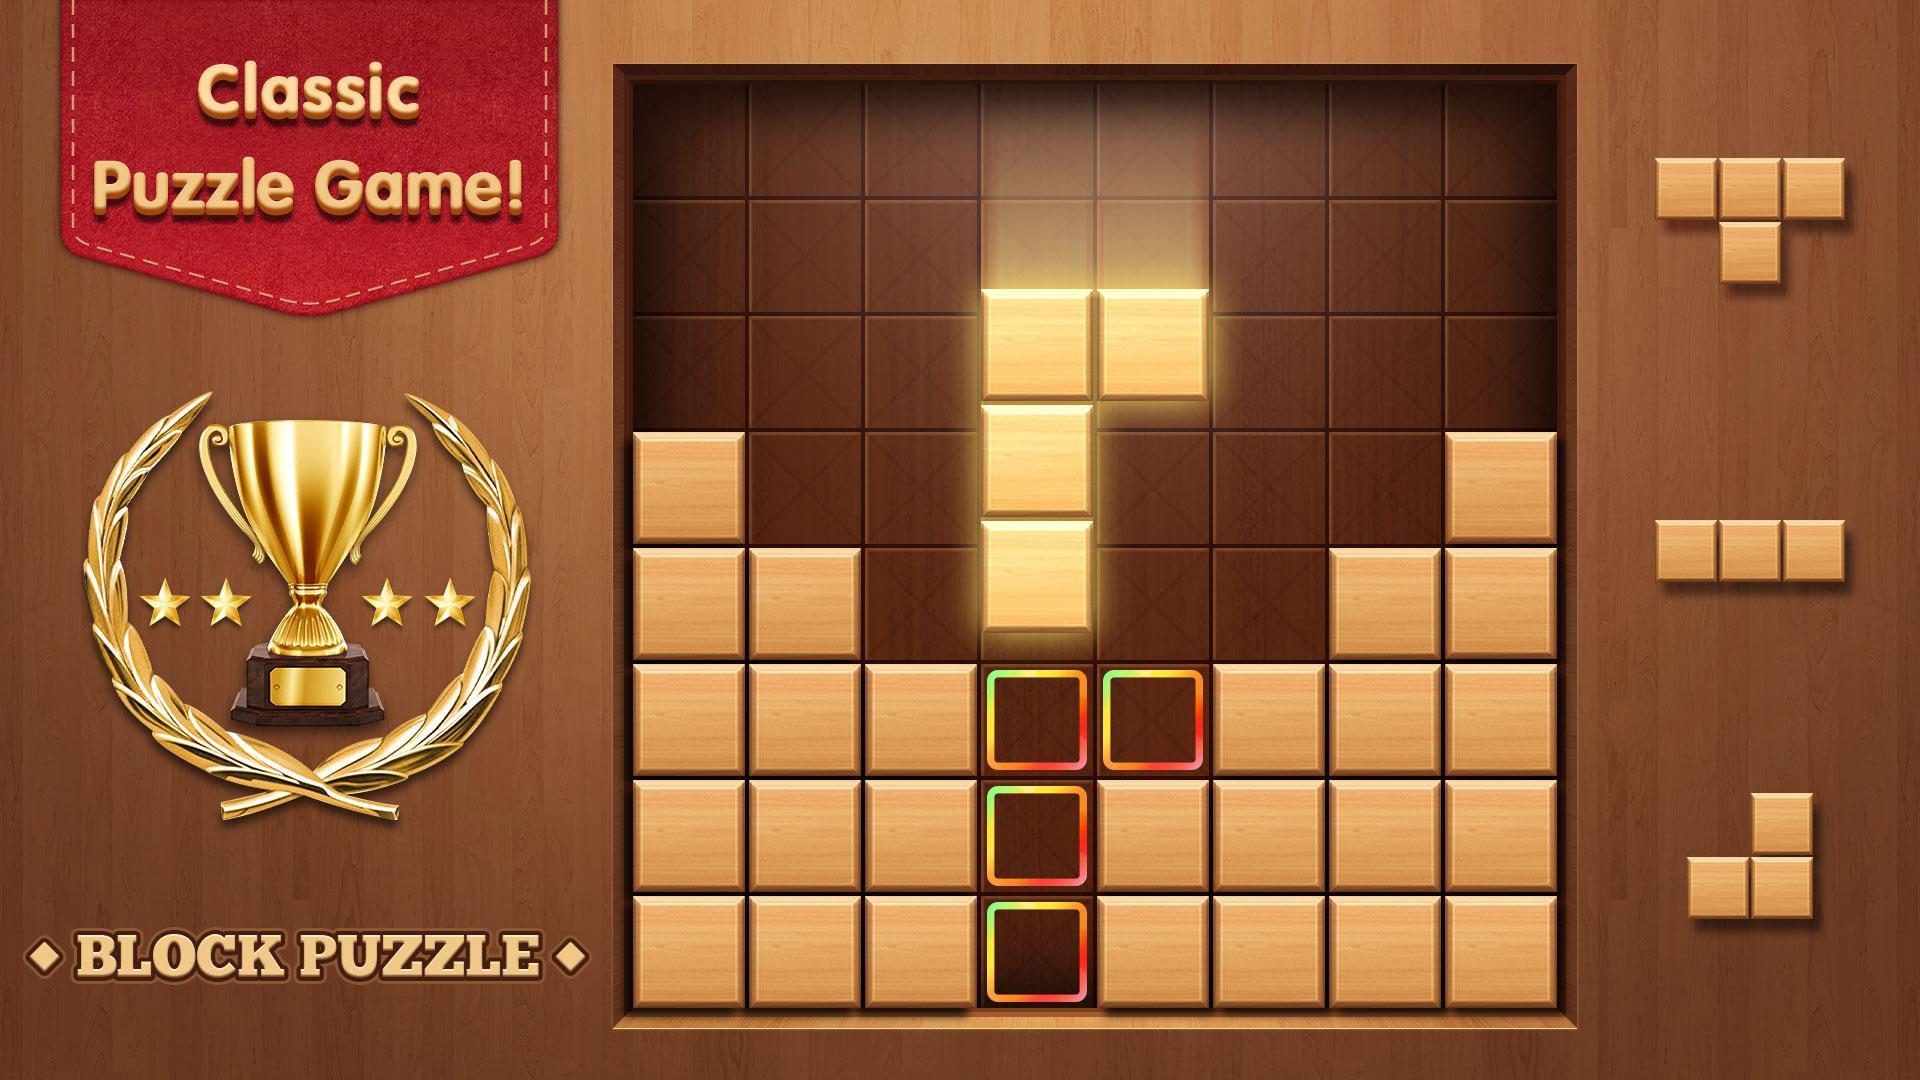 WoodBlockLegend-ClassicPuzzleGame 1.1.2 Screenshot 9